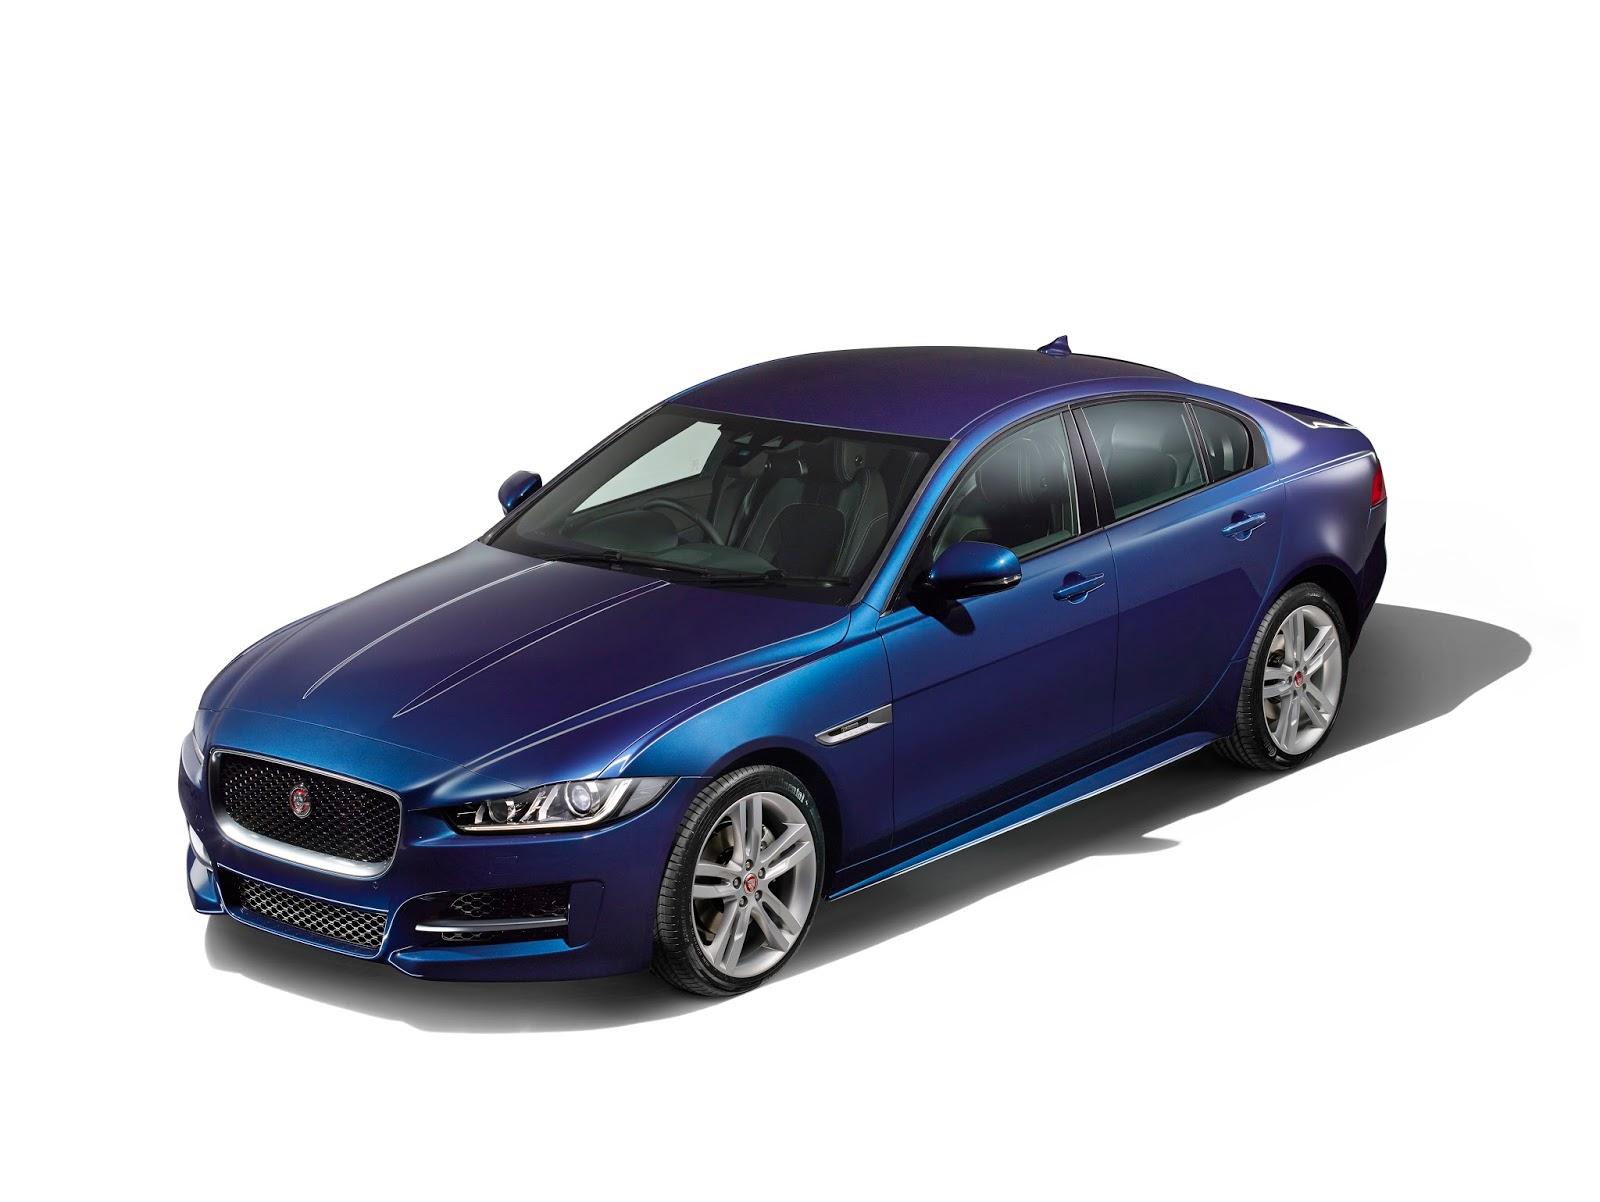 motoring malaysia short test drive the jaguar xe 2 0 prestige xe 2 0 r sport. Black Bedroom Furniture Sets. Home Design Ideas